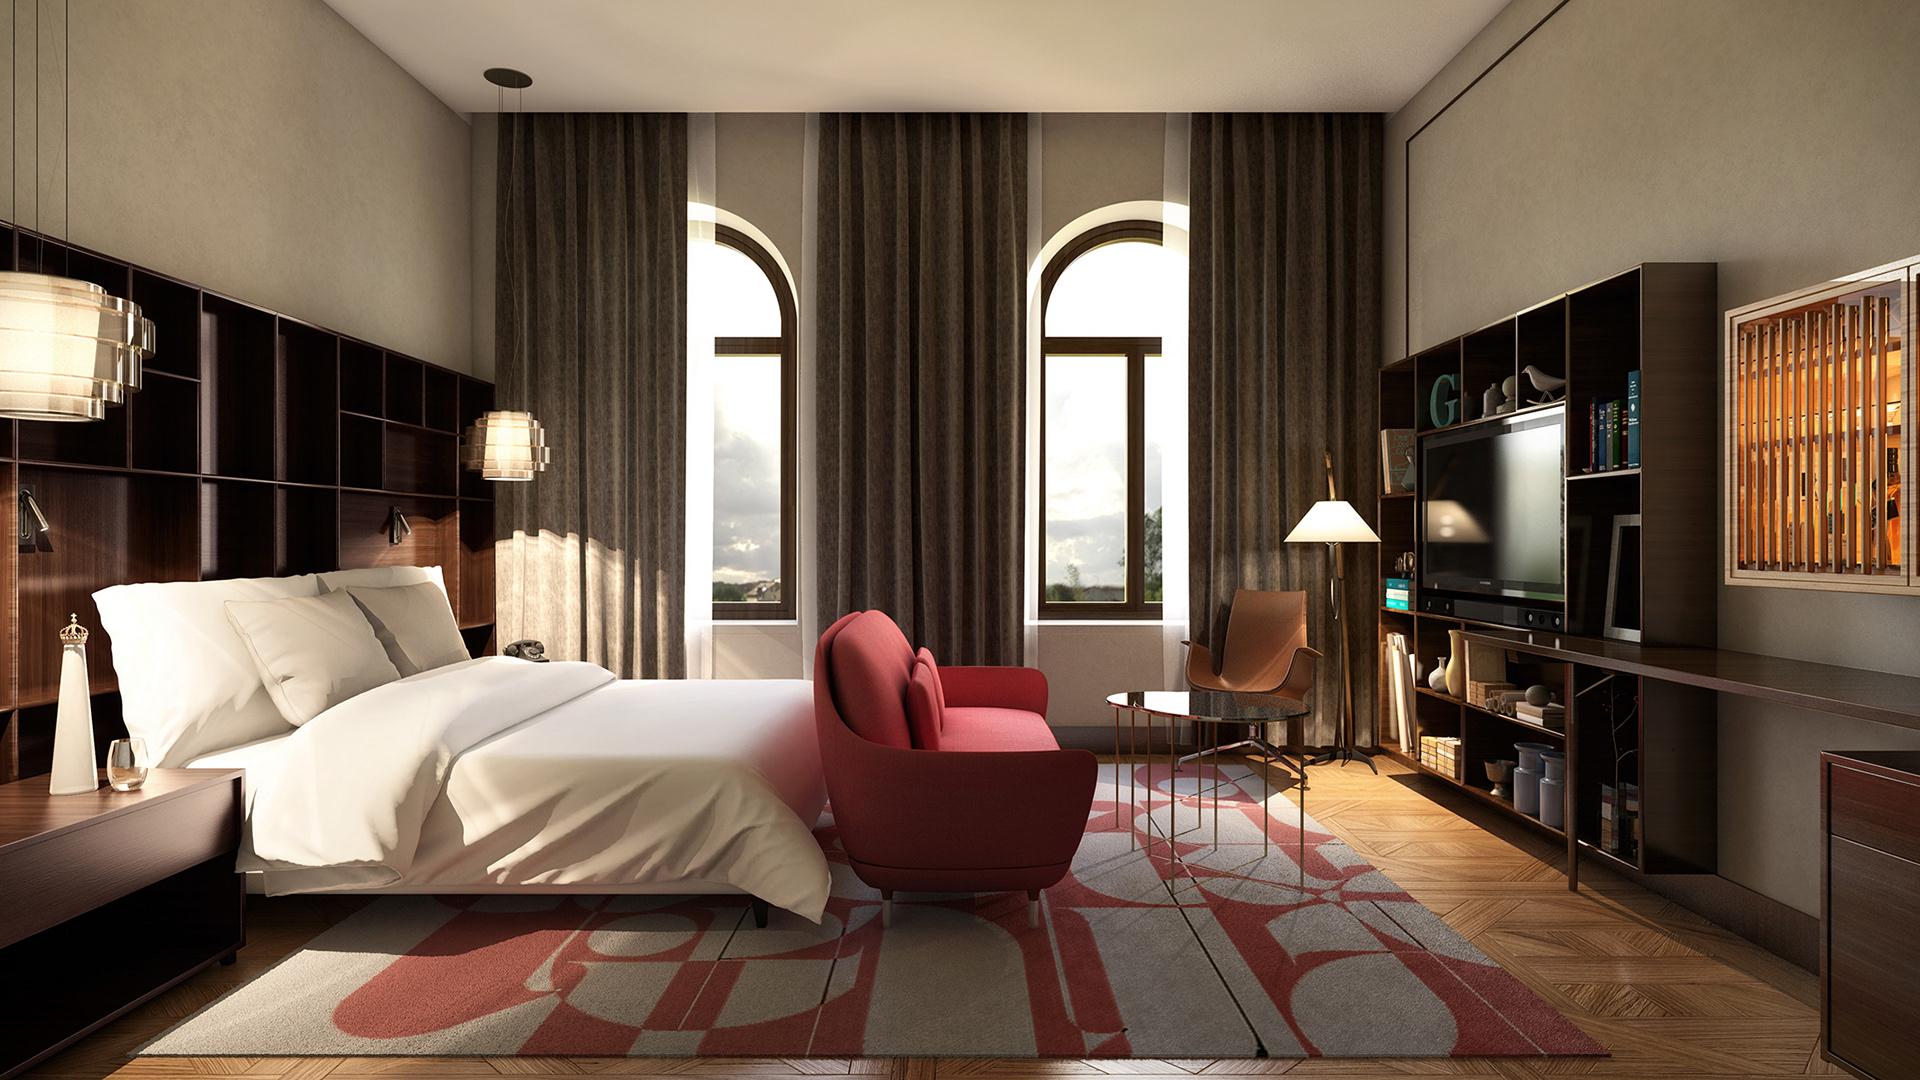 visualización arquitectónica de dormitorio en dubai